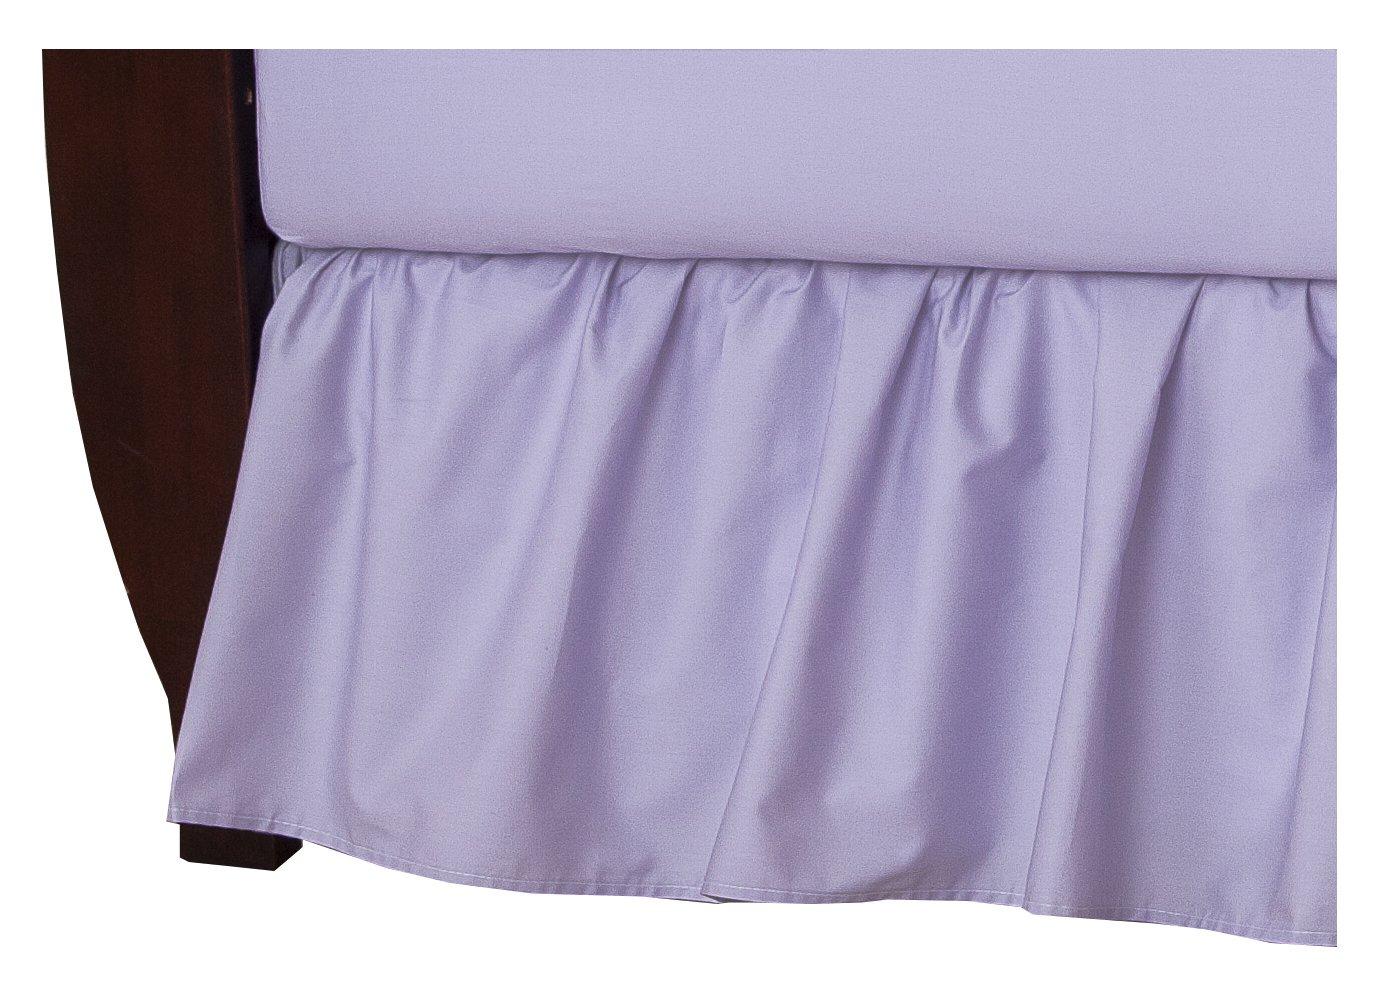 Aqua American Baby Company 100/% Cotton Percale Ruffled Crib Skirt